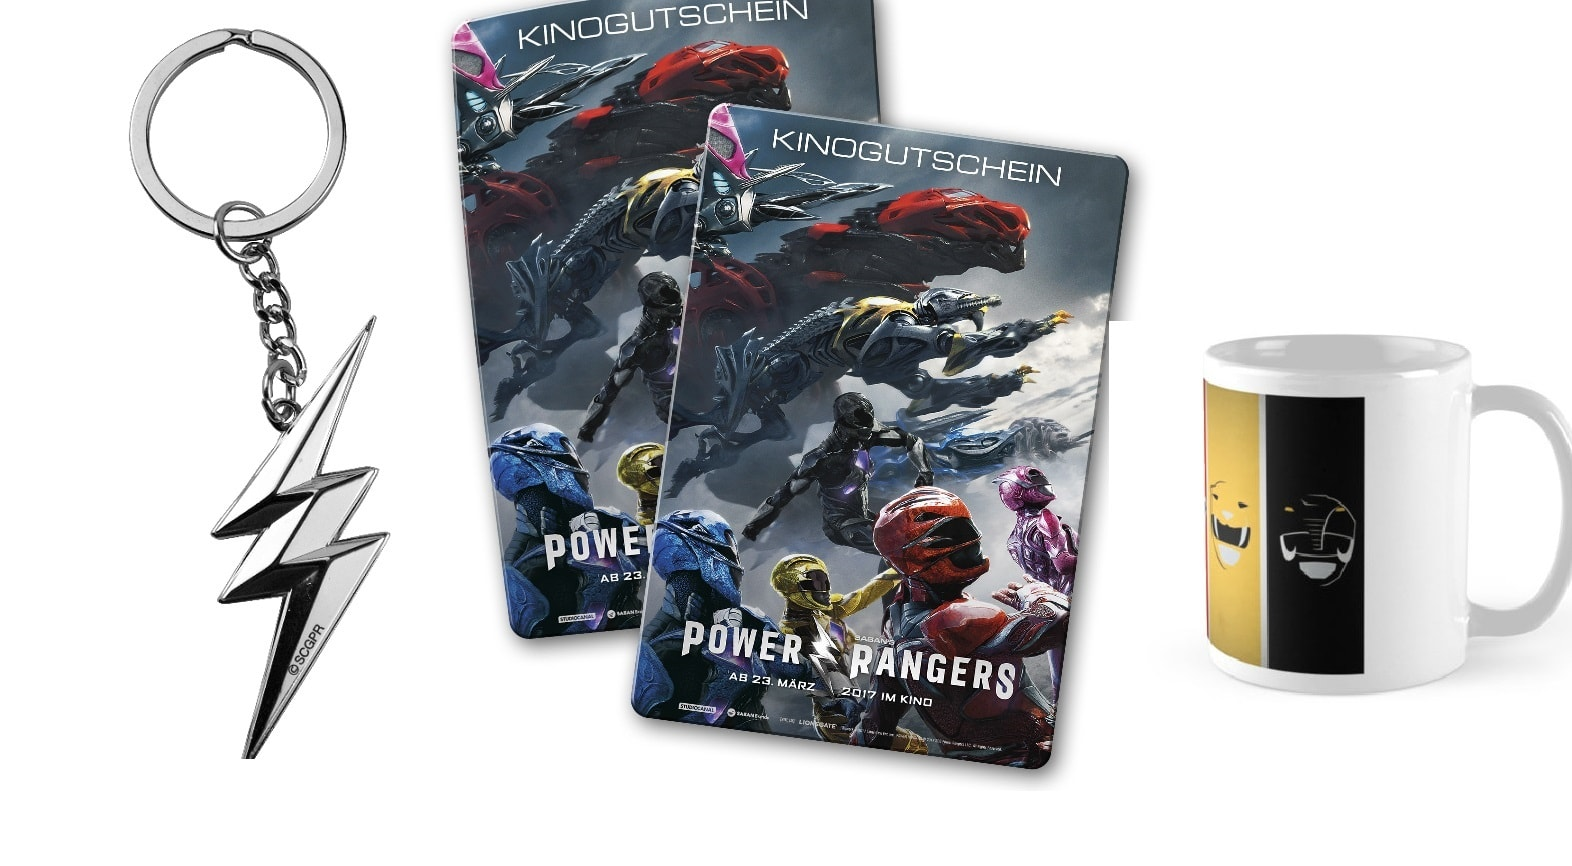 Power Rangers - Mockup - Kinogutschein